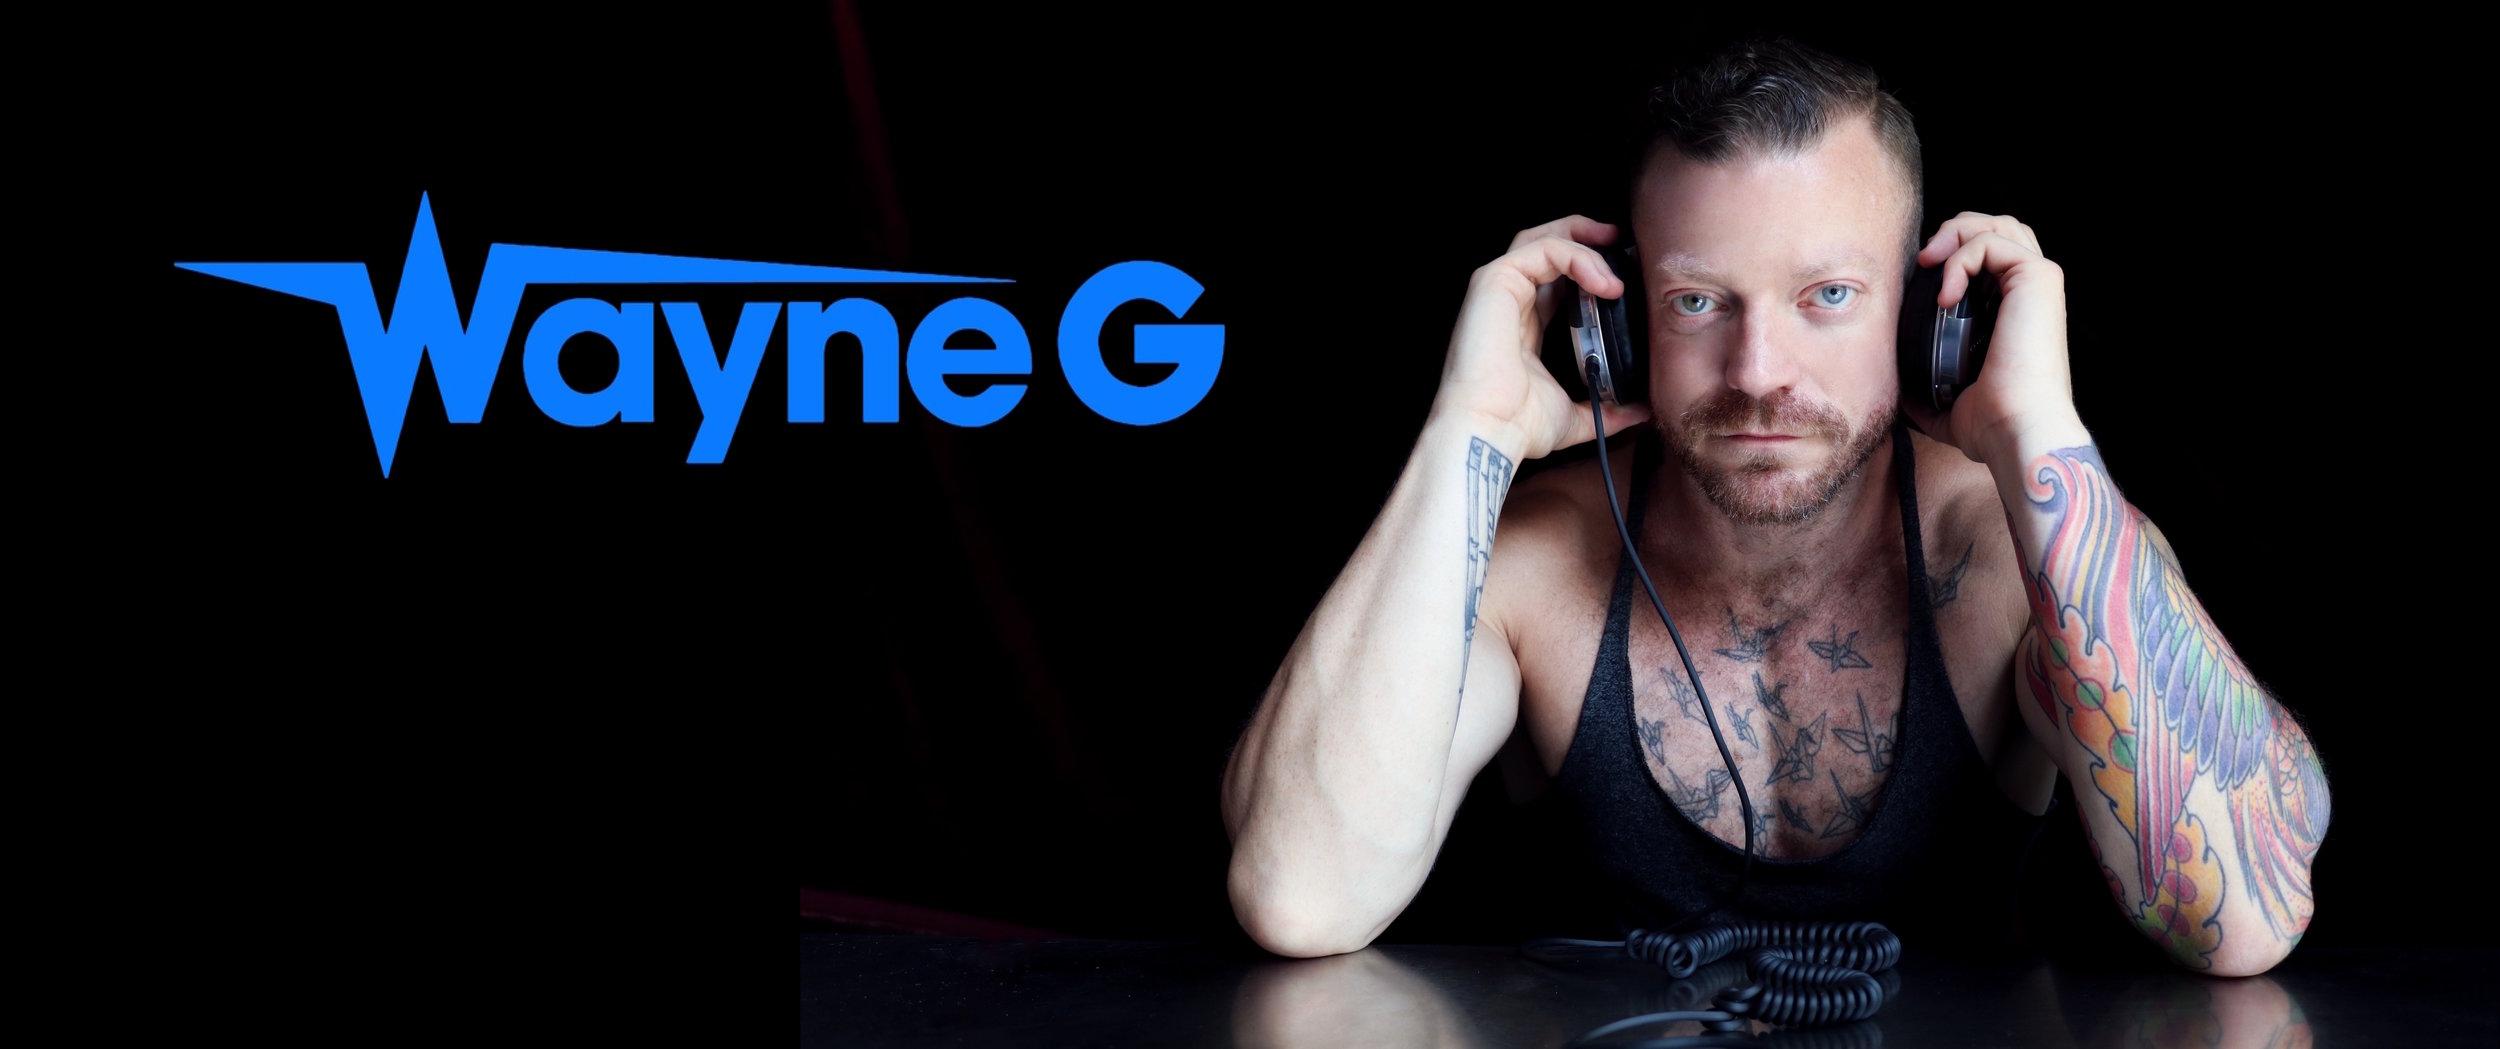 Wayne17-1.jpeg